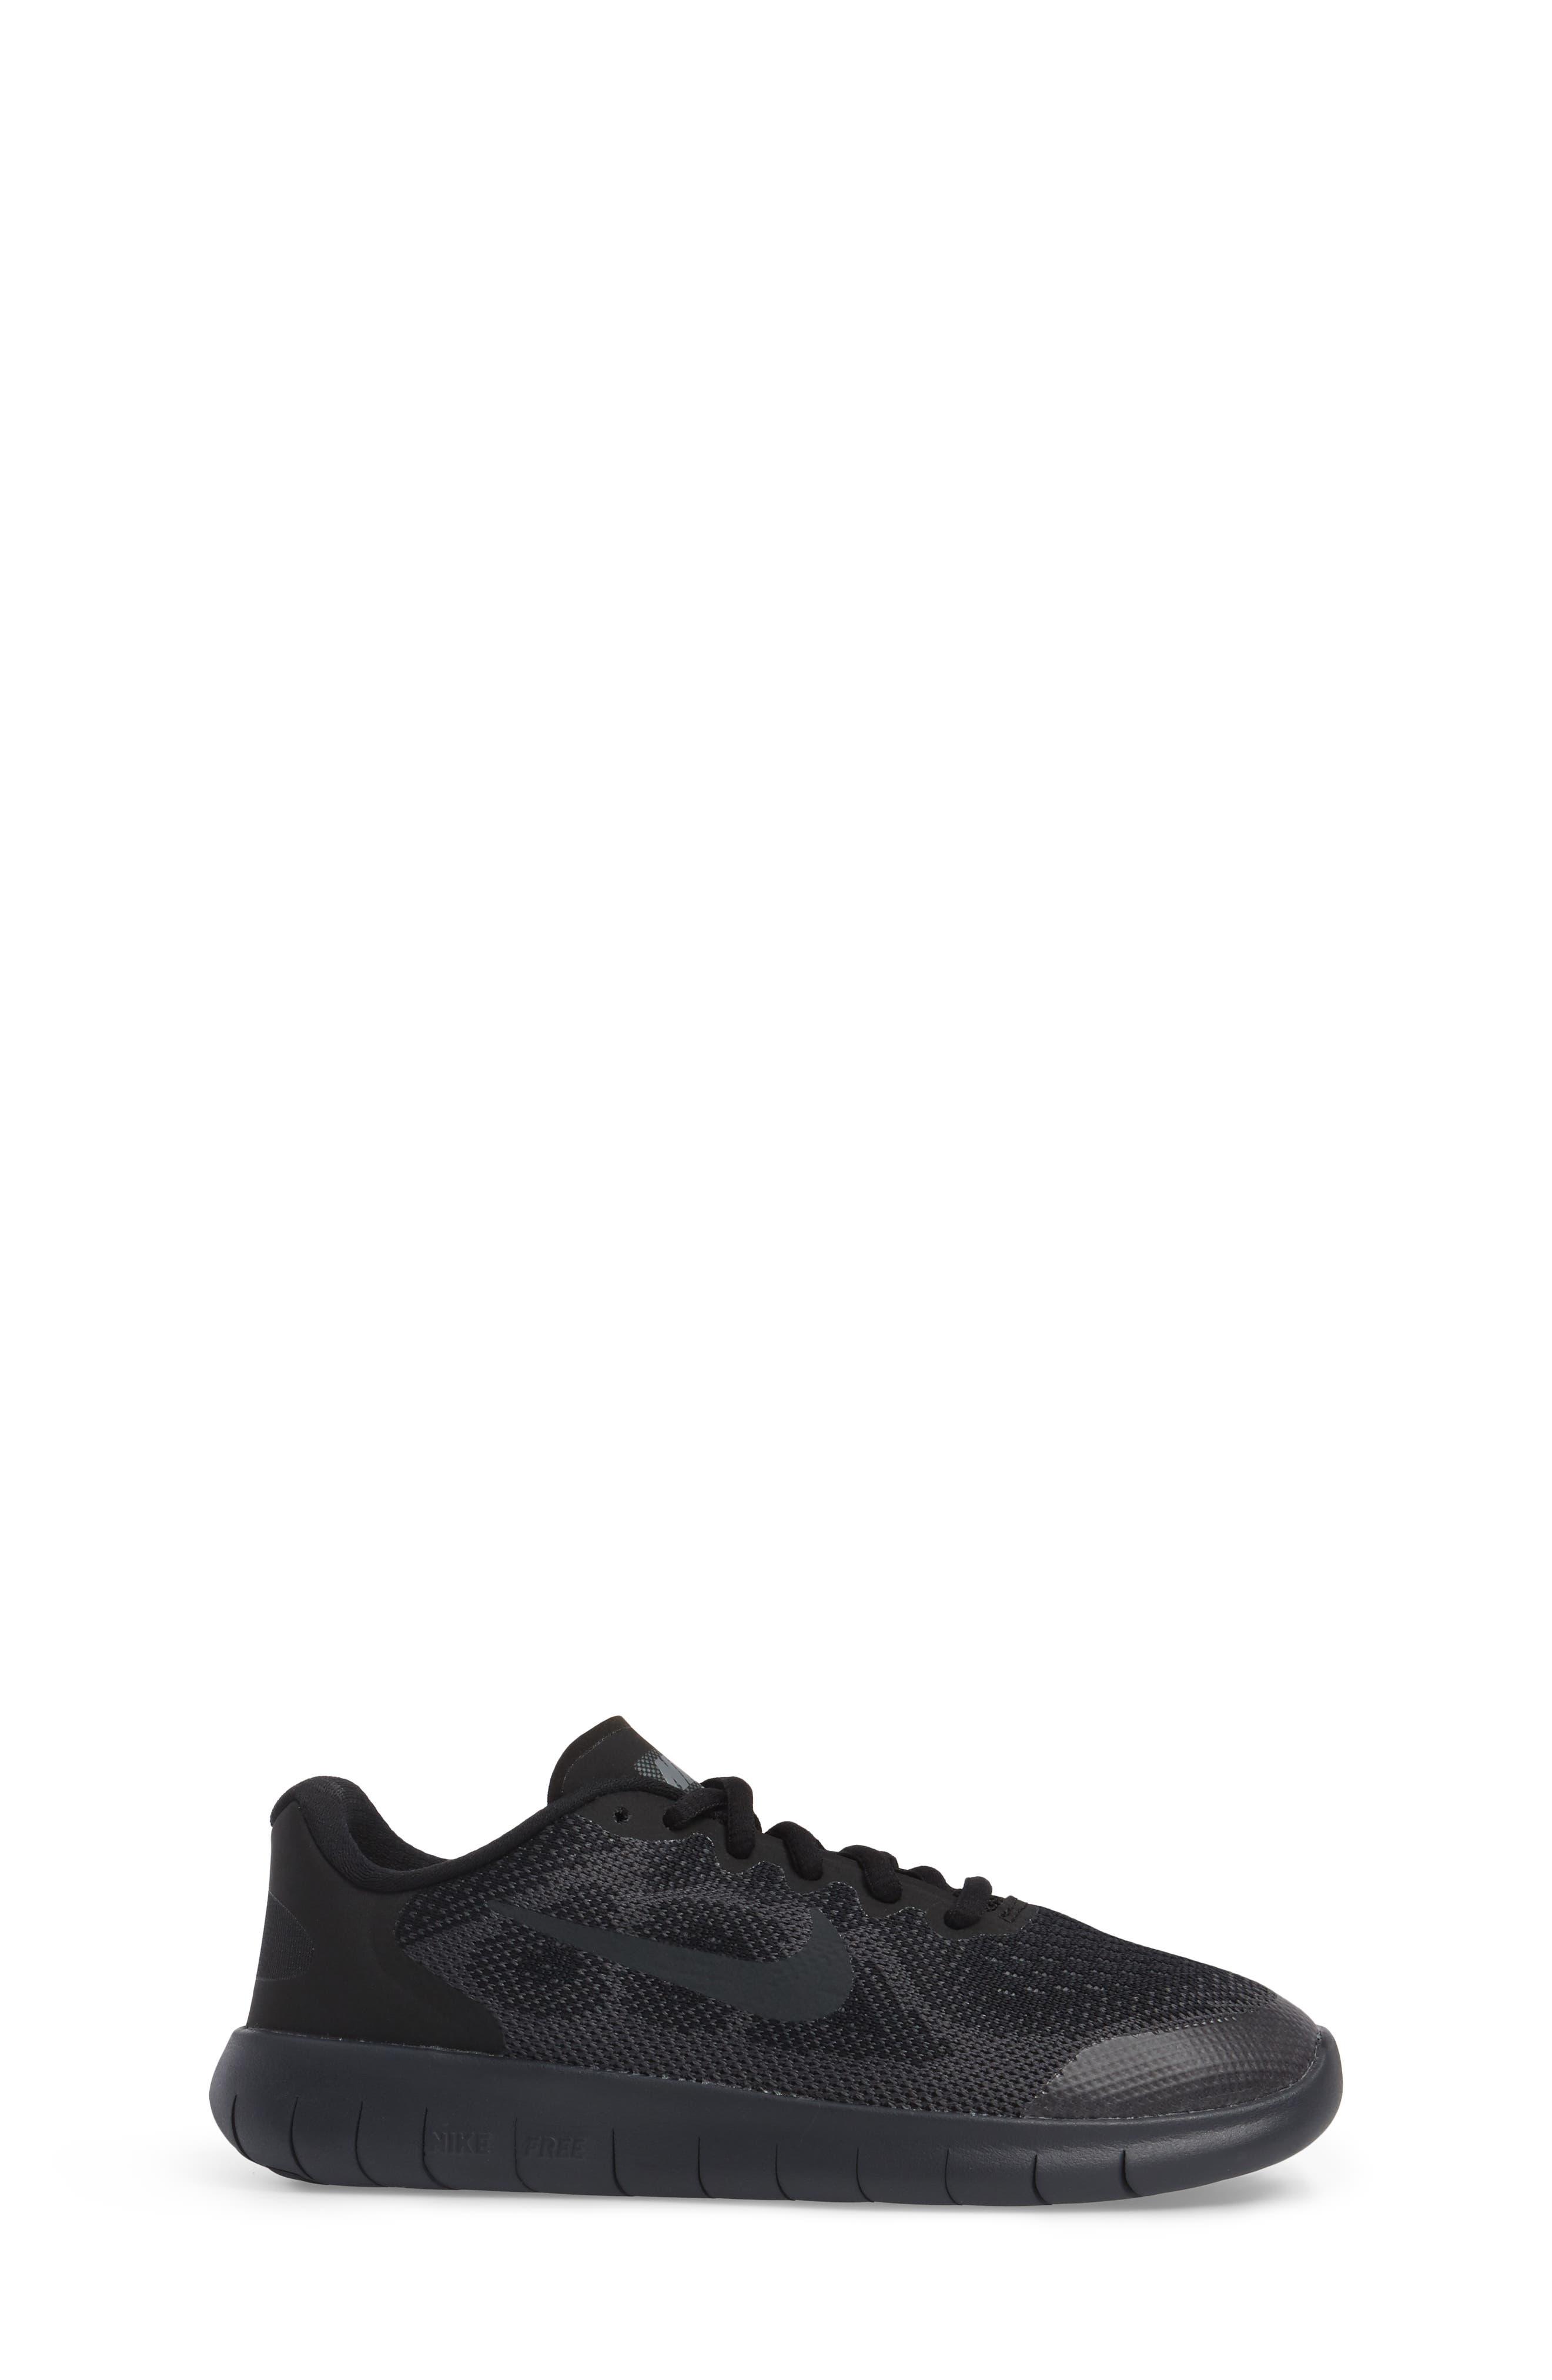 Free RN Running Shoe,                             Alternate thumbnail 3, color,                             Black/ Anthracite/ Dark Grey